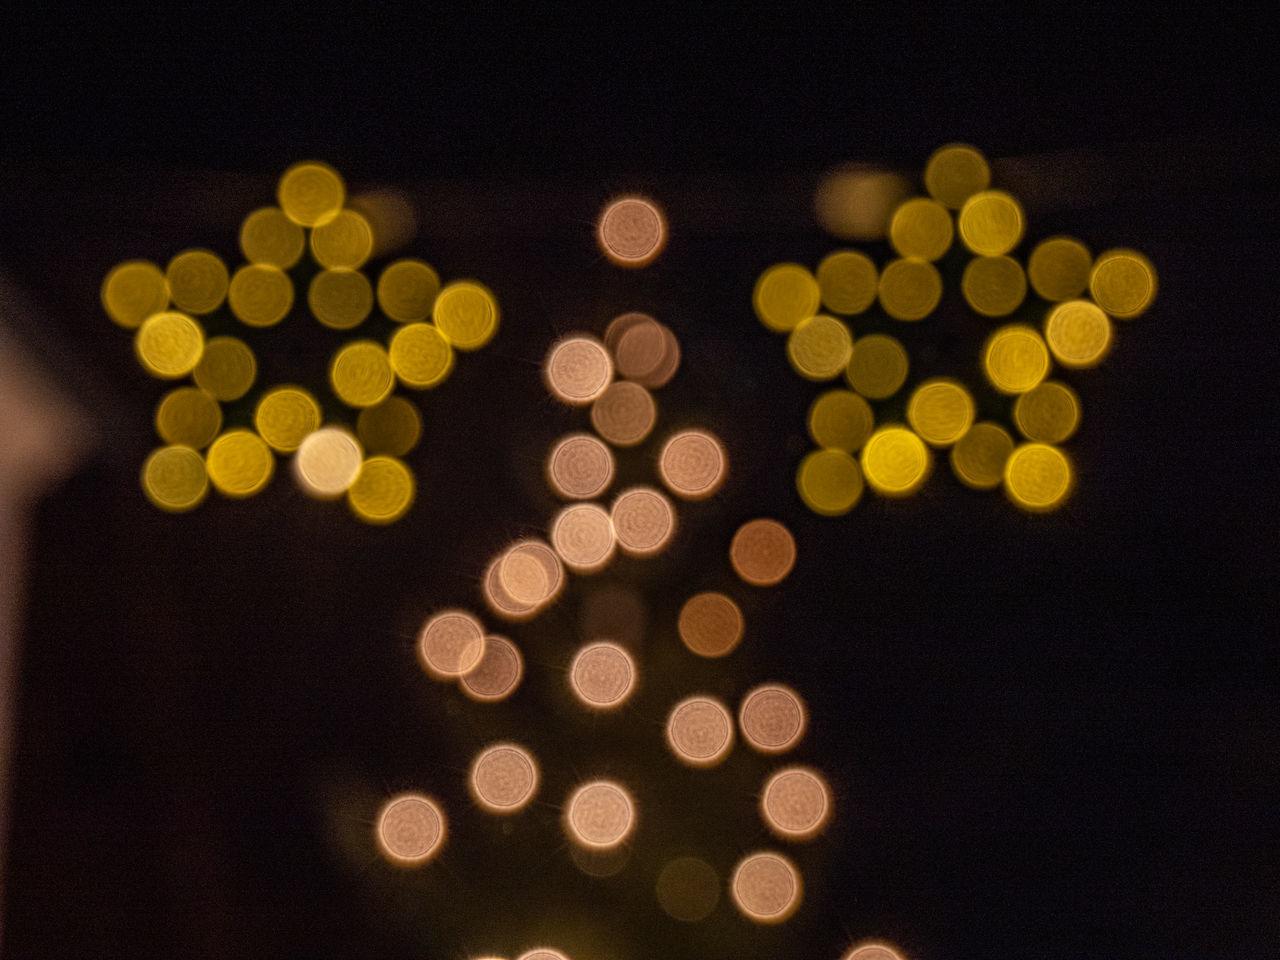 illuminated, defocused, indoors, lighting equipment, night, no people, shape, christmas, black background, glowing, celebration, decoration, christmas decoration, light, holiday, geometric shape, studio shot, circle, christmas lights, pattern, lens flare